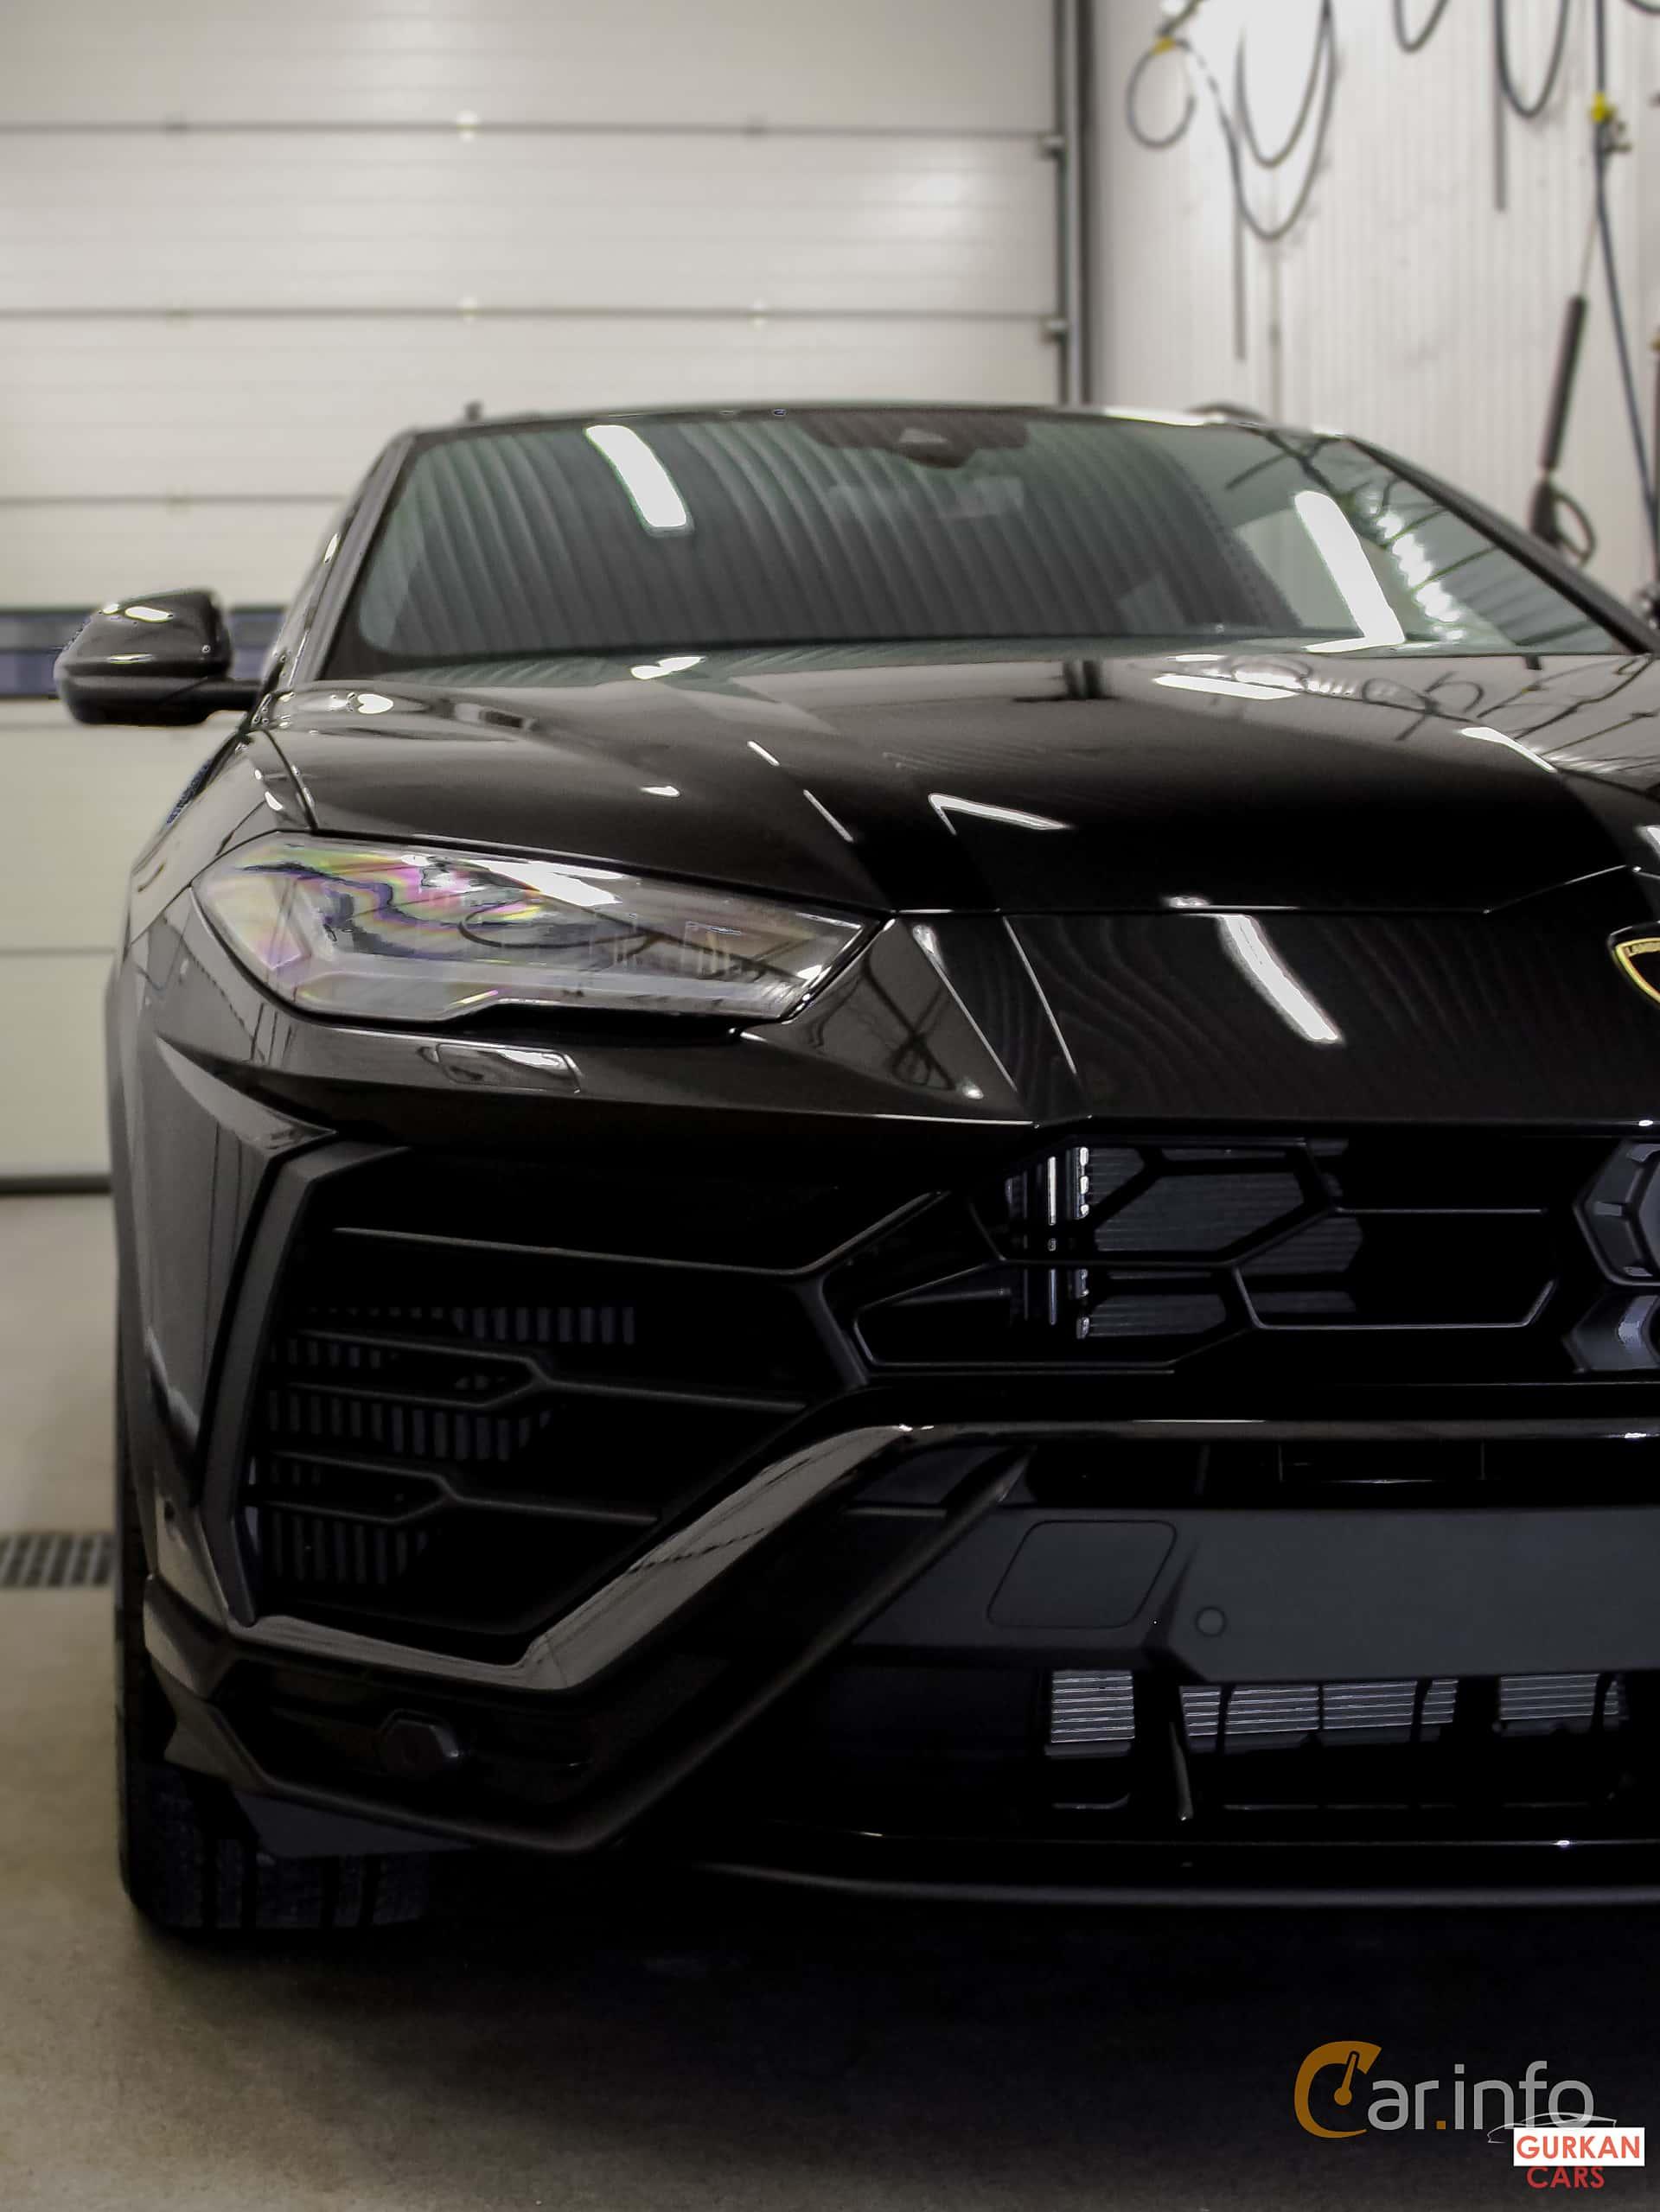 Lamborghini Urus 4.0 V8 AWD Automatic, 650hp, 2018